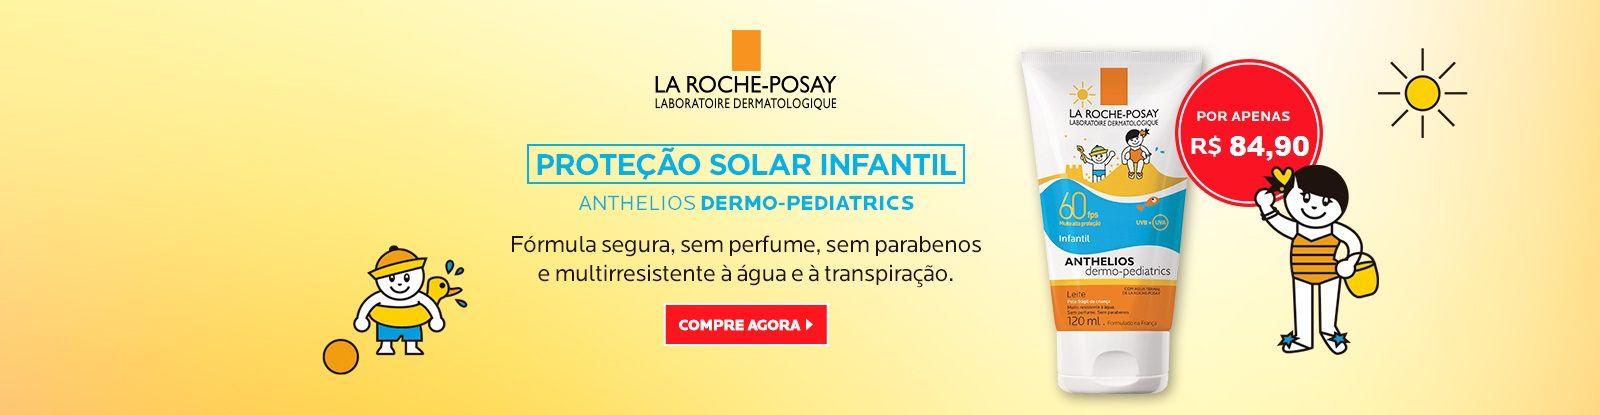 DermoPediatrics